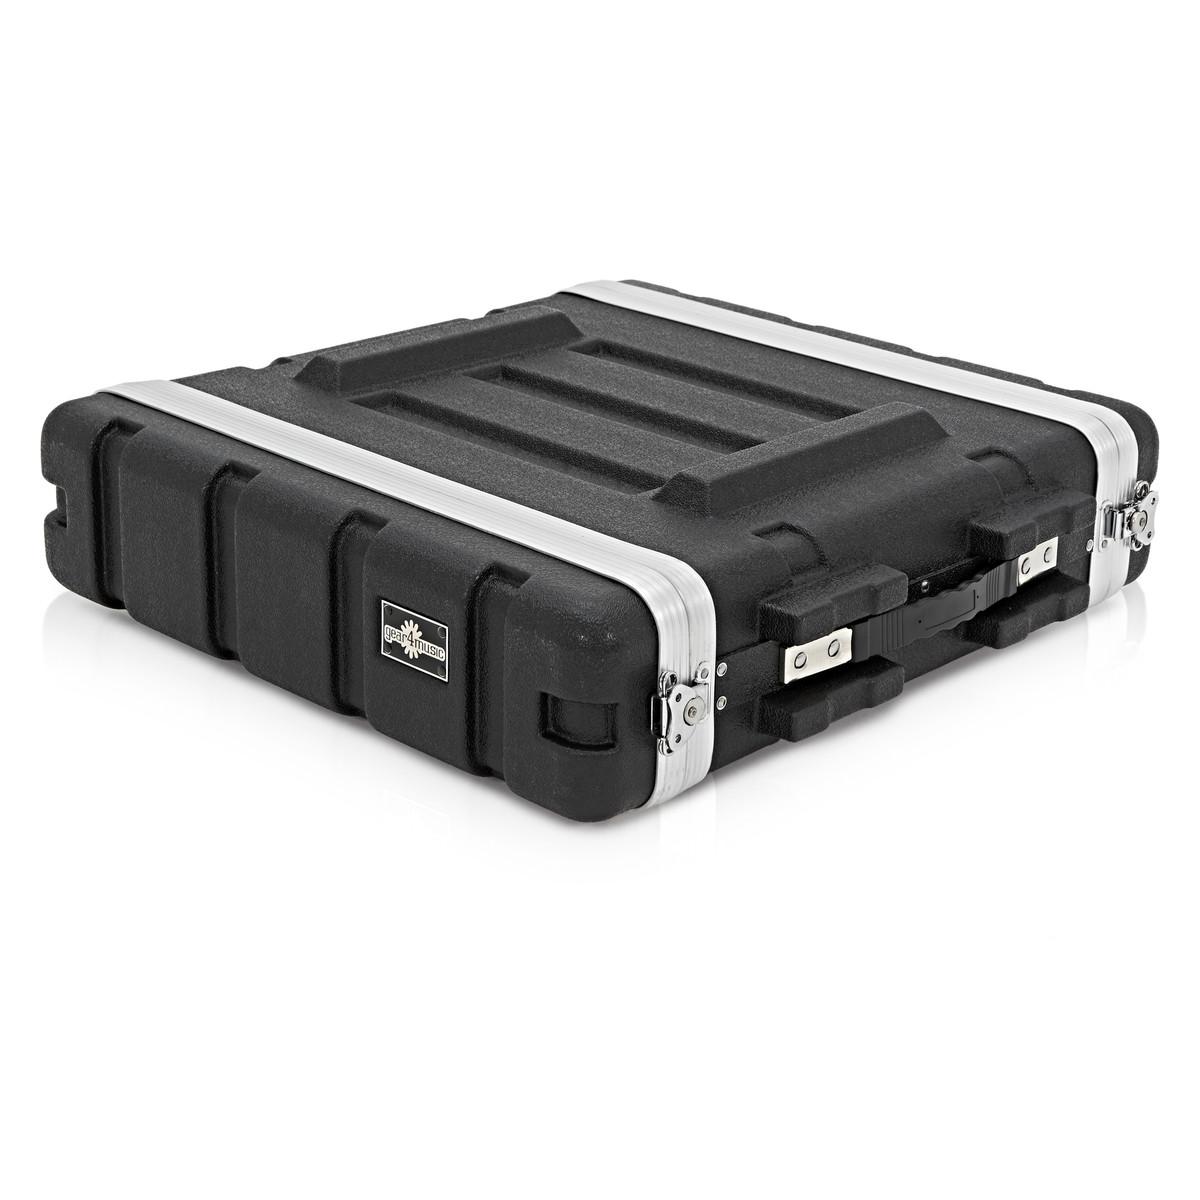 "Image of 2U 19 Rack Case by Gear4music"""